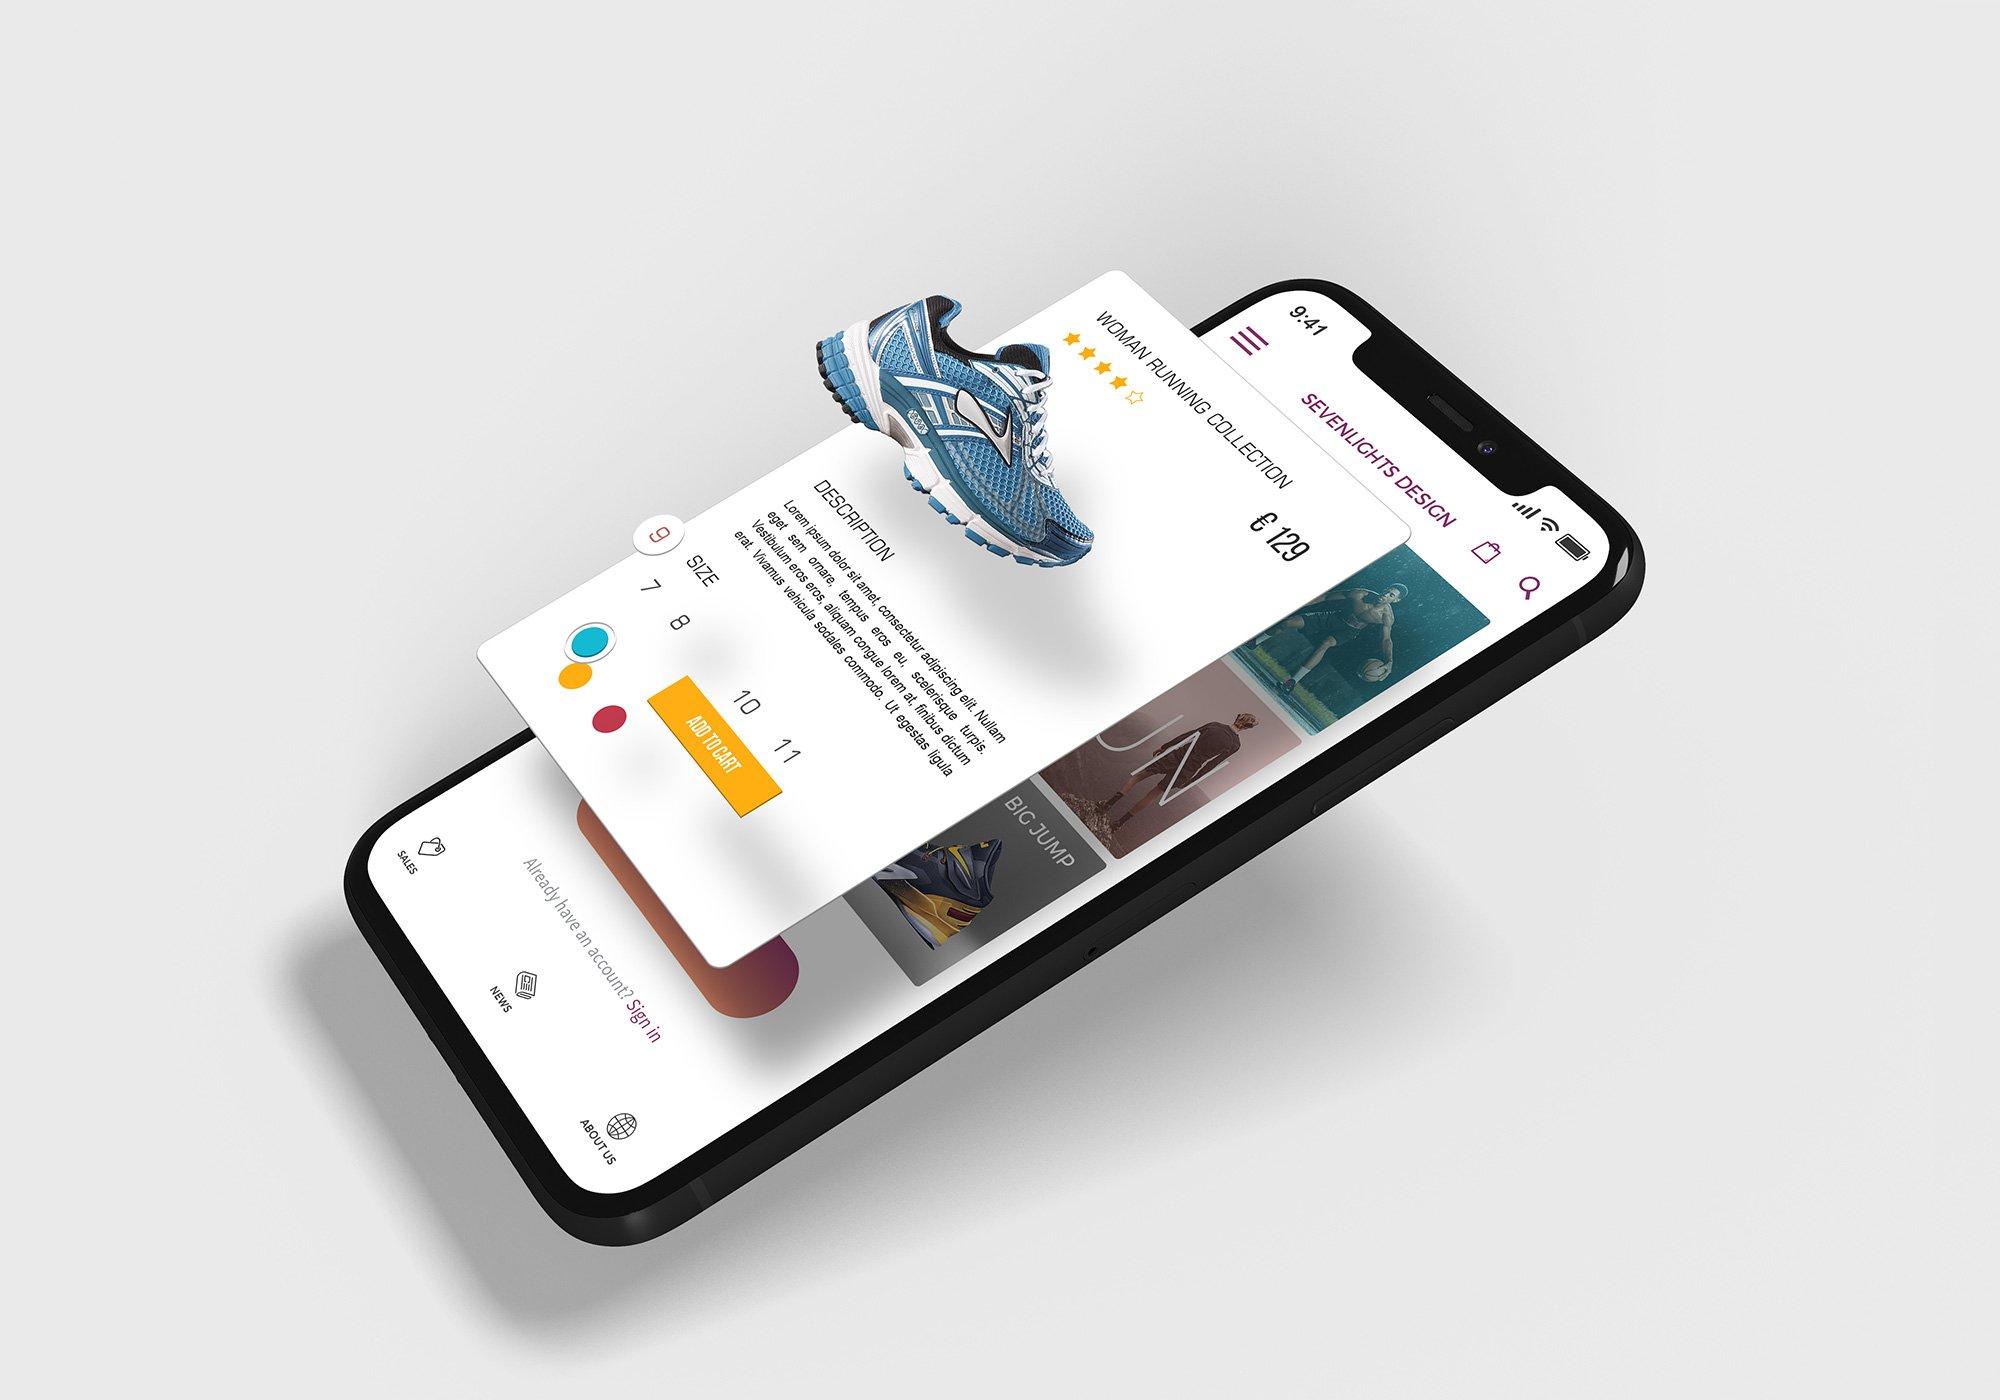 APP应用设计iPhone X屏幕演示样机模板 iPhone X Multilayer Mockup Set插图(1)